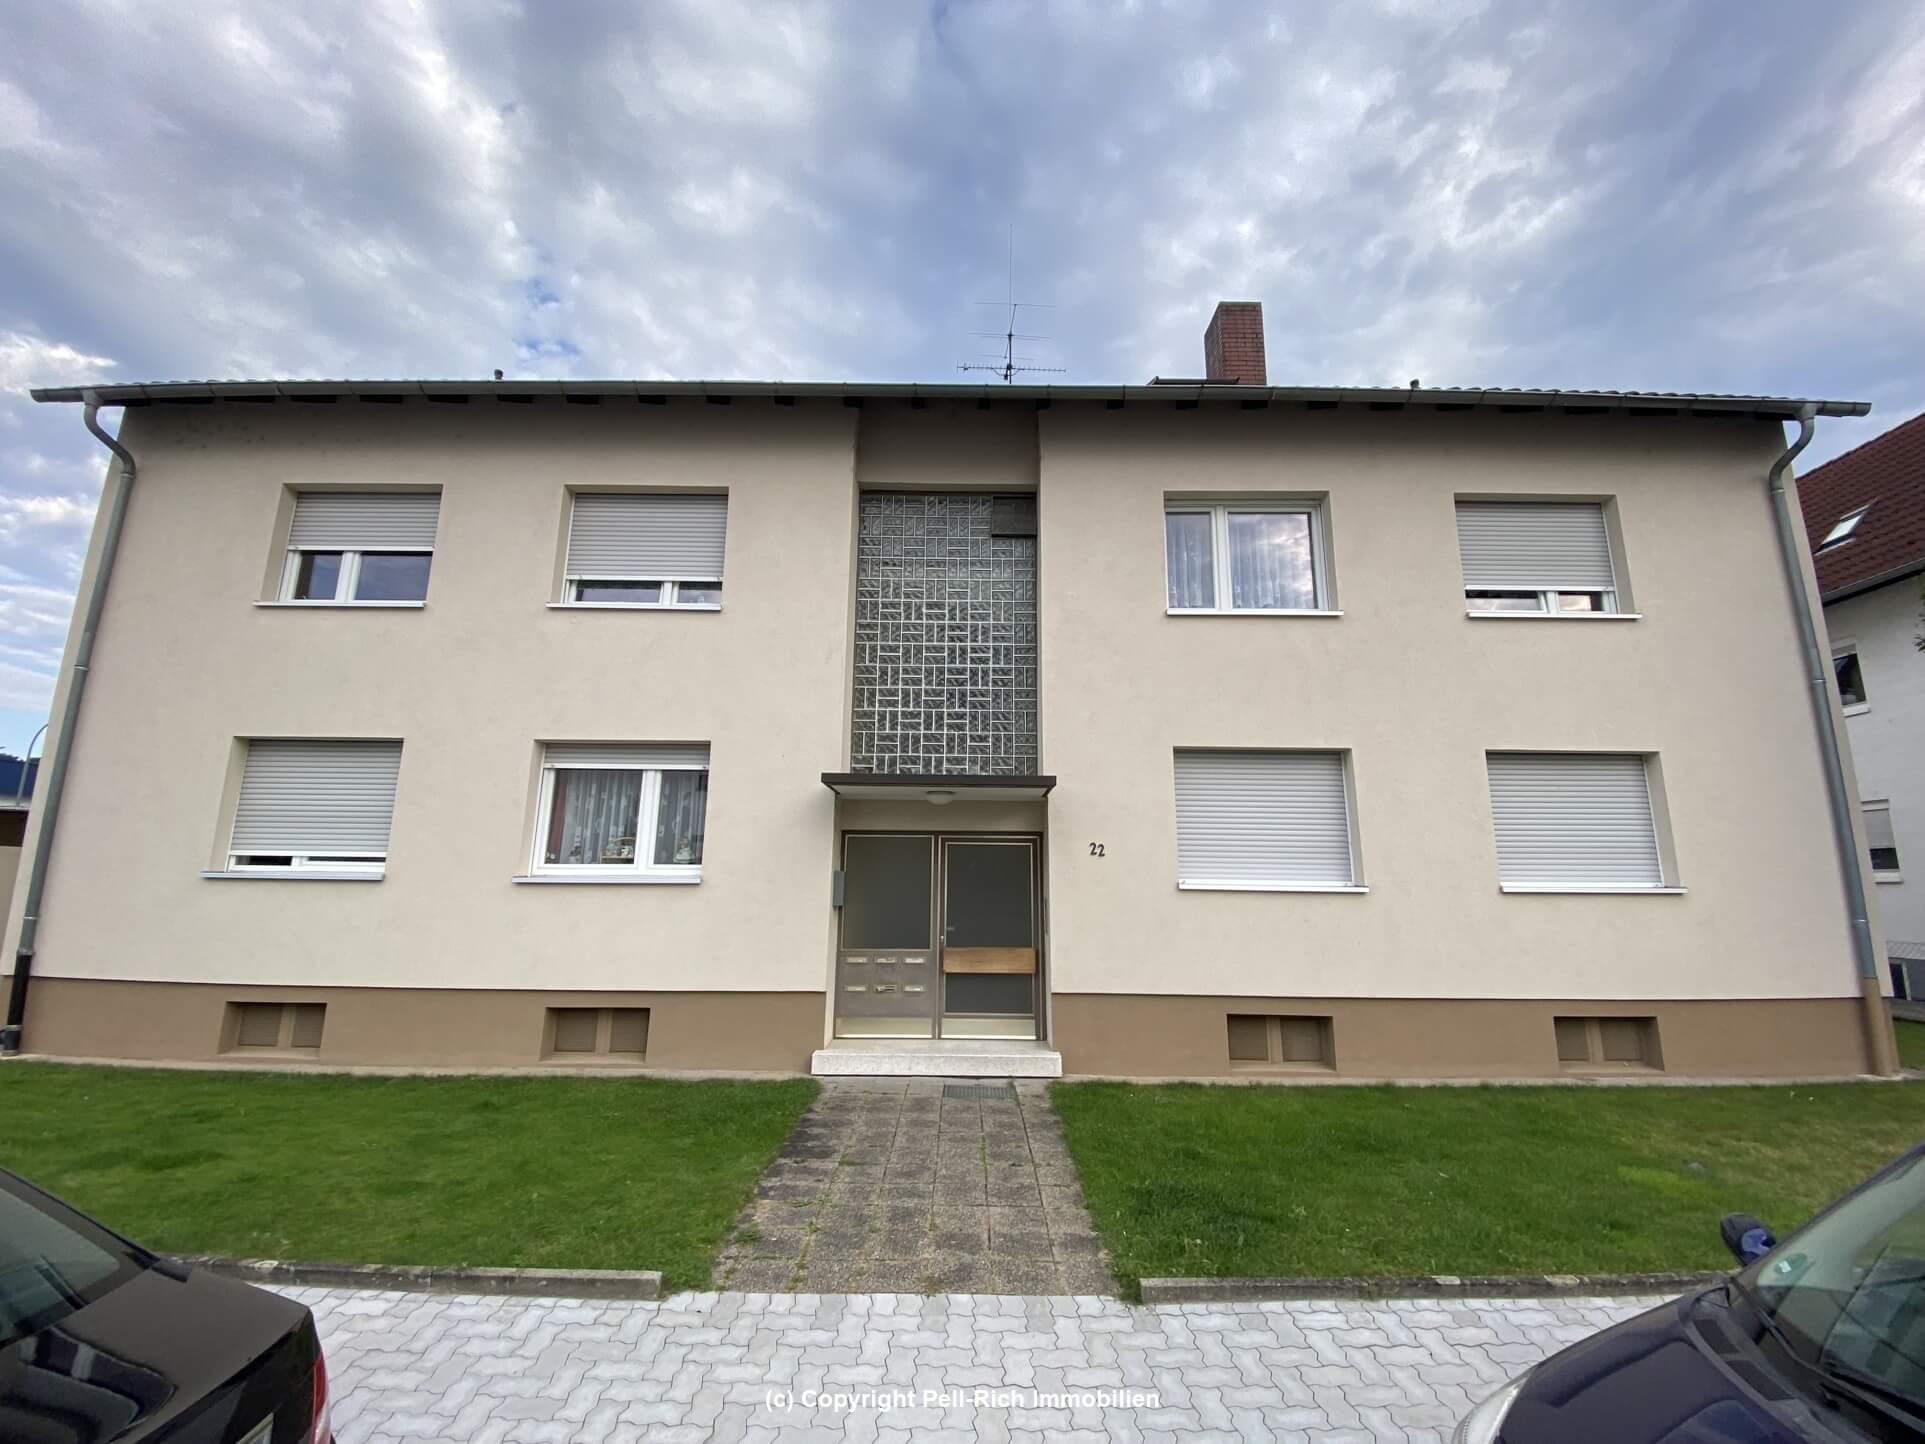 GLÜCKSTREFFER: Geräumige, helle Souterrain-Wohnung in Karlsruhe-Neureut